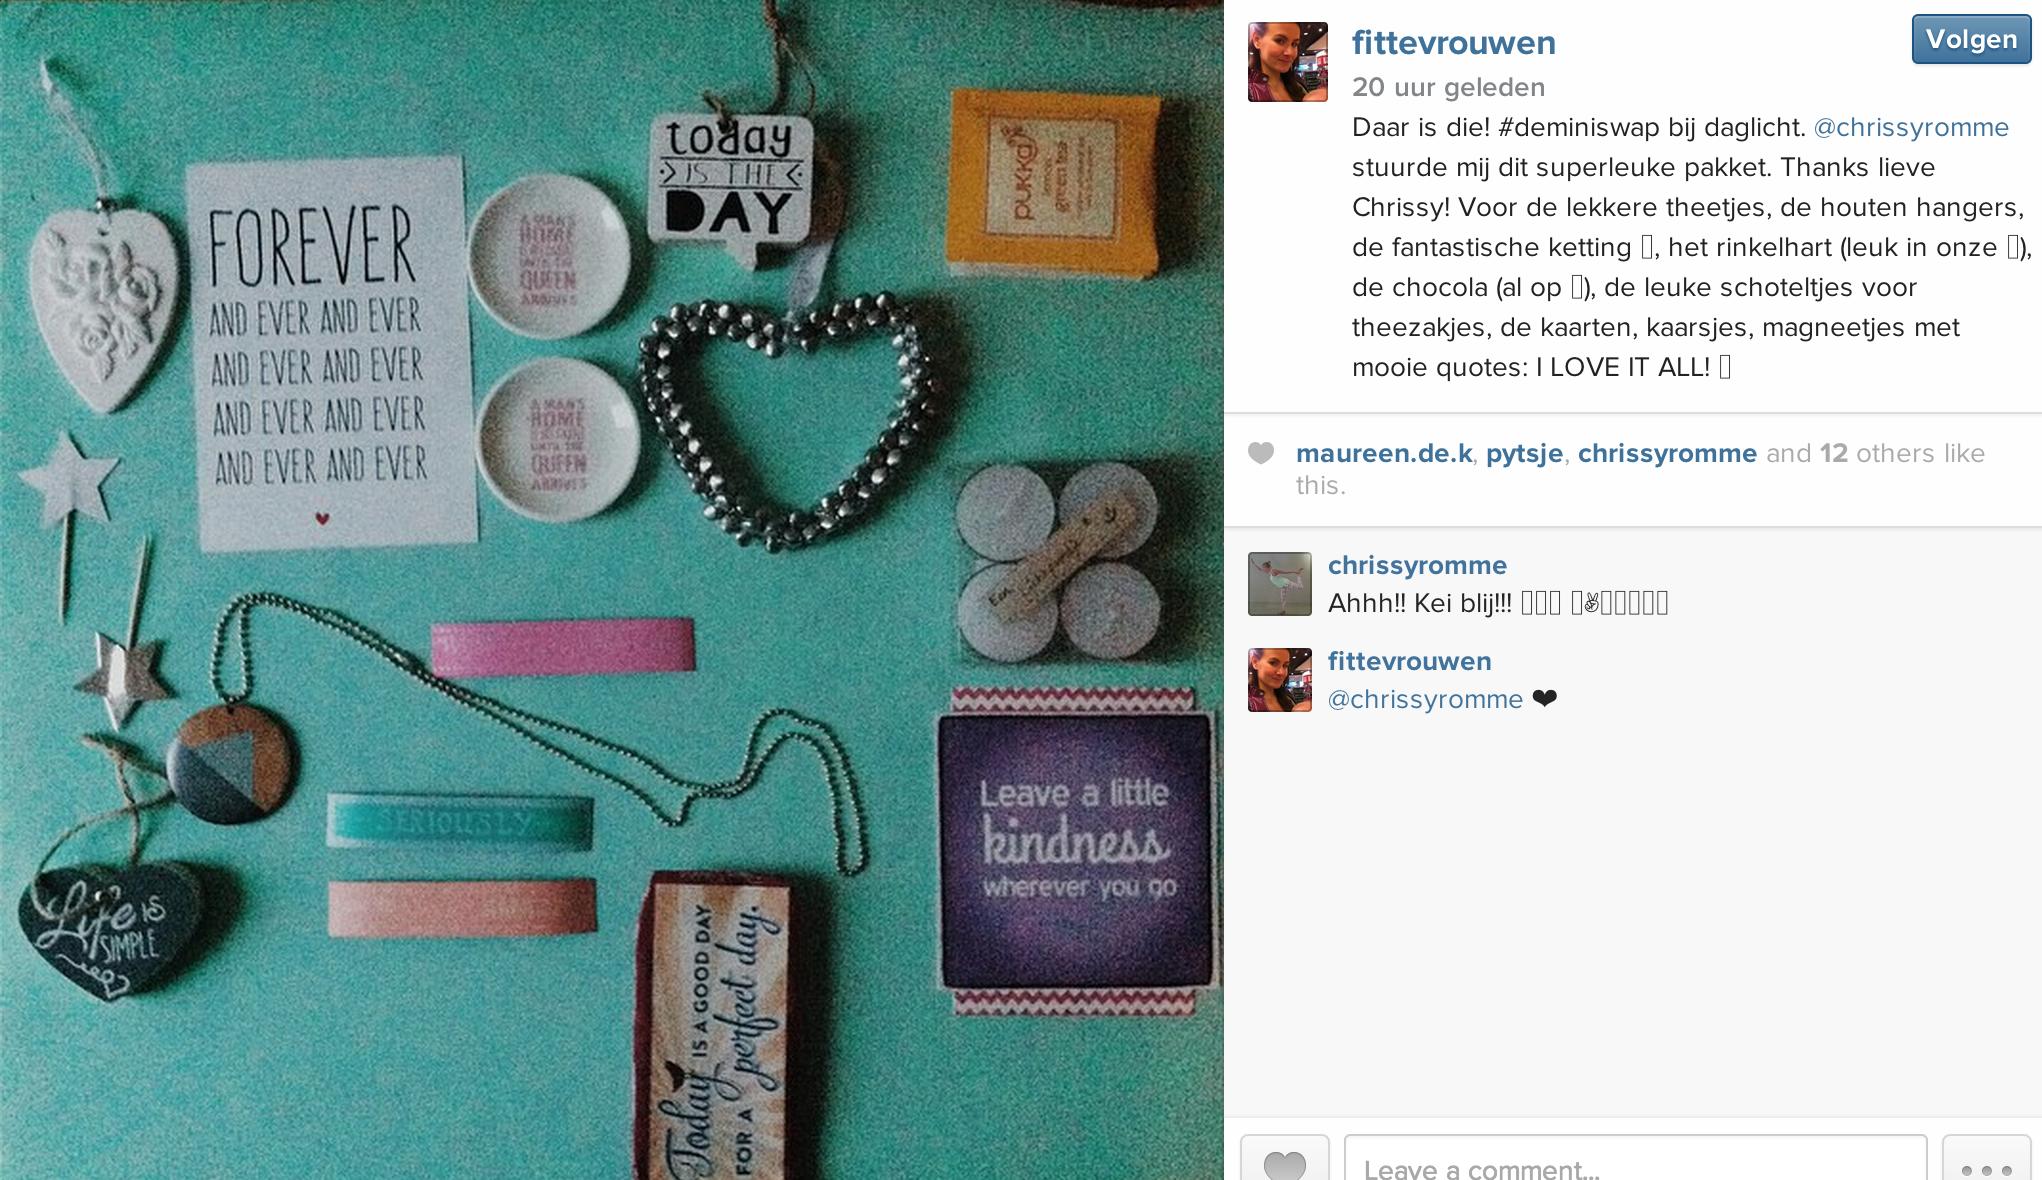 swap review 👍 💕💋💄👛👓 (@qaseh_sahara) • Instagram photos and ...